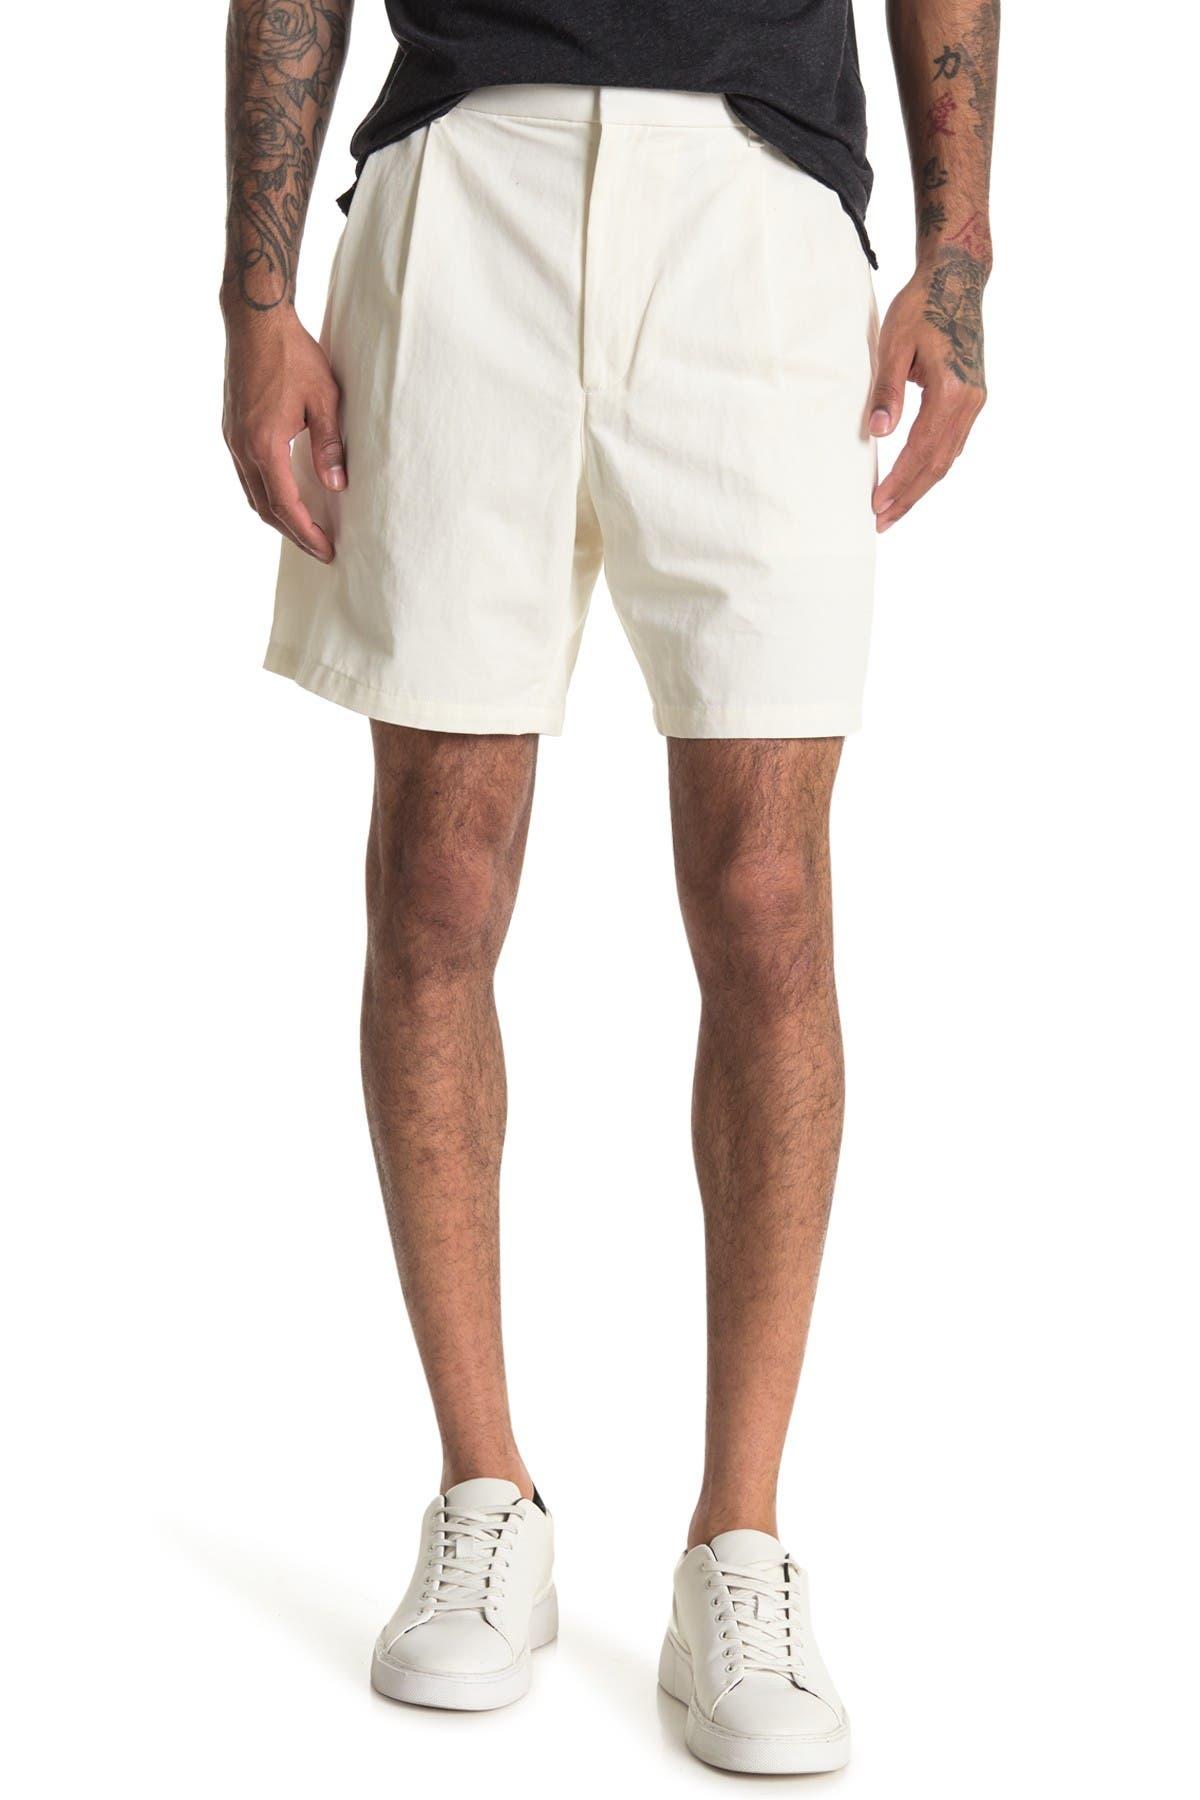 Image of Rag & Bone Jackson Woven Shorts